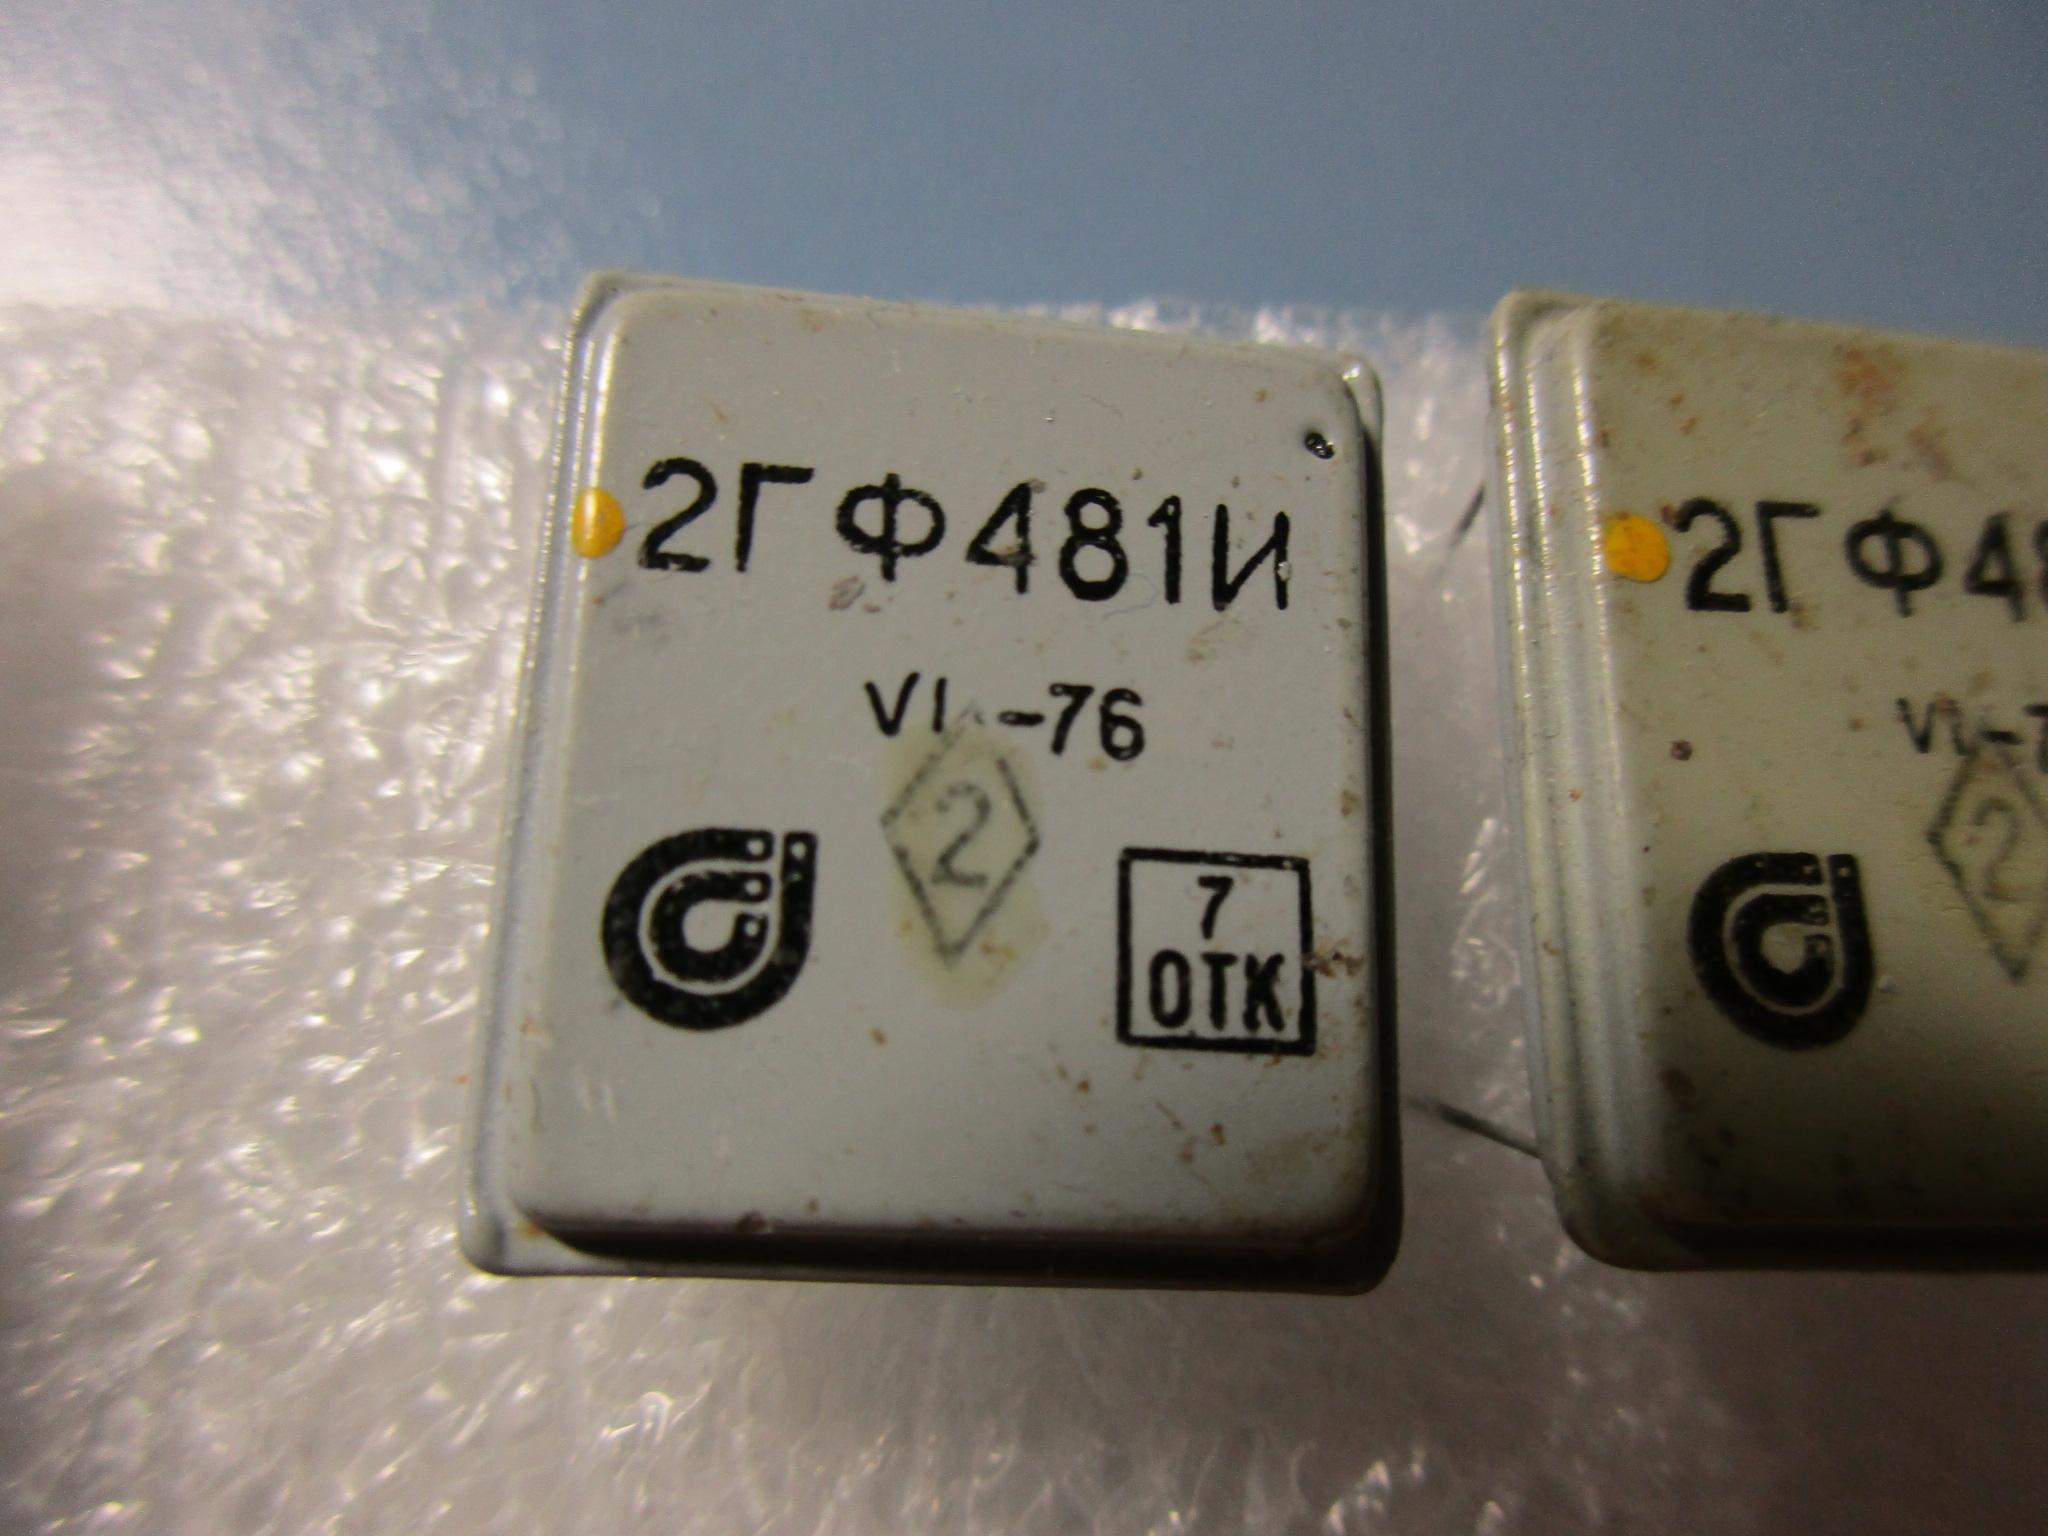 2ГФ481И.JPG